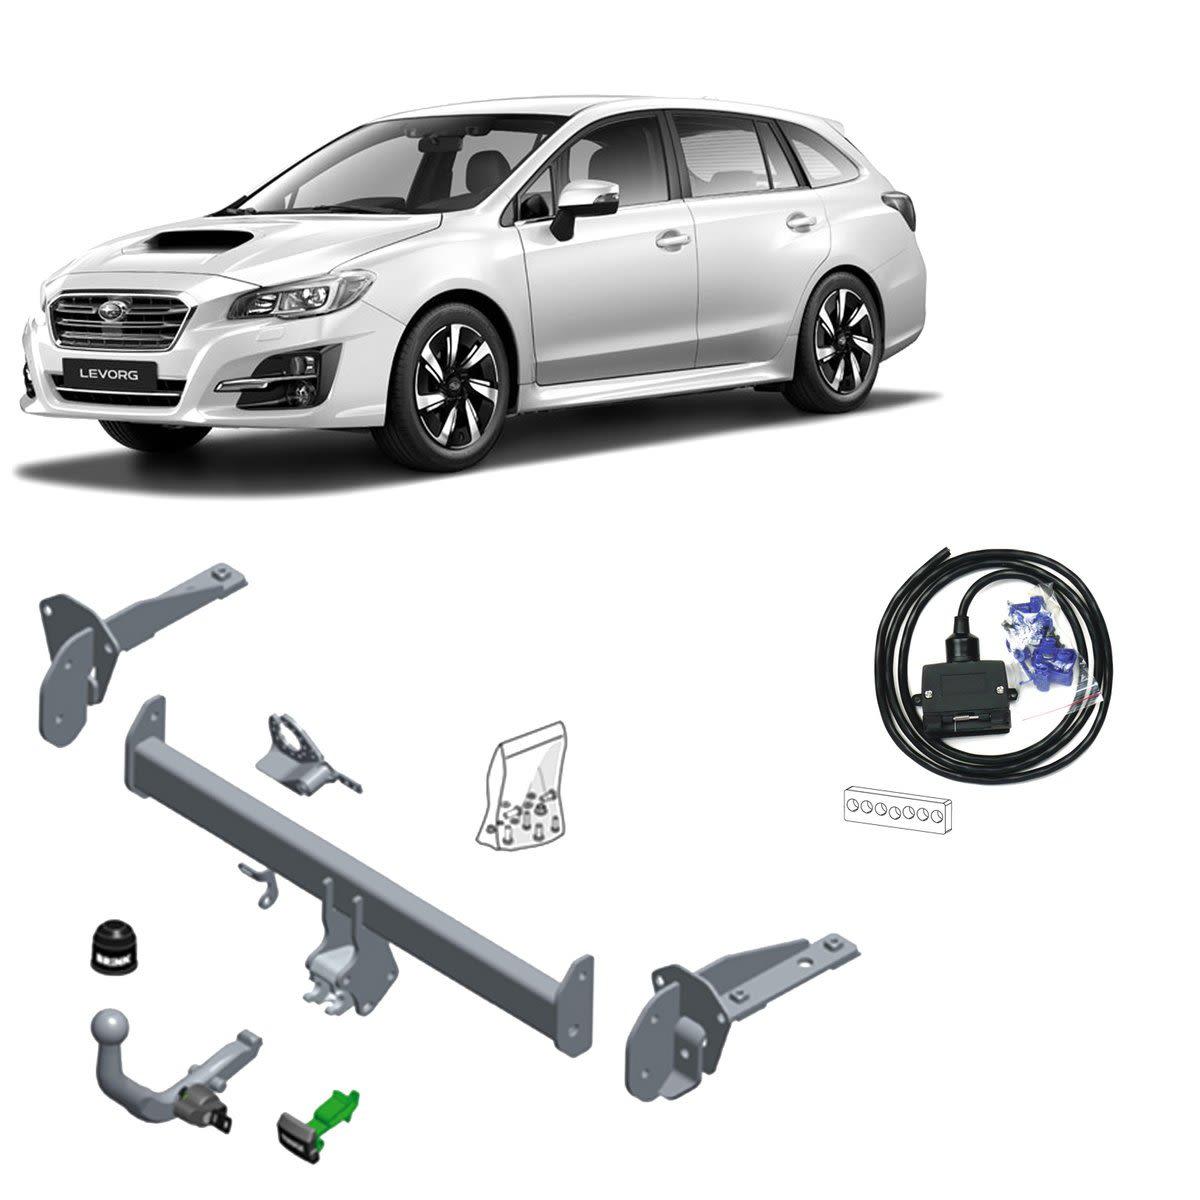 Brink Towbar to suit Subaru Levorg (03/2015 - on)